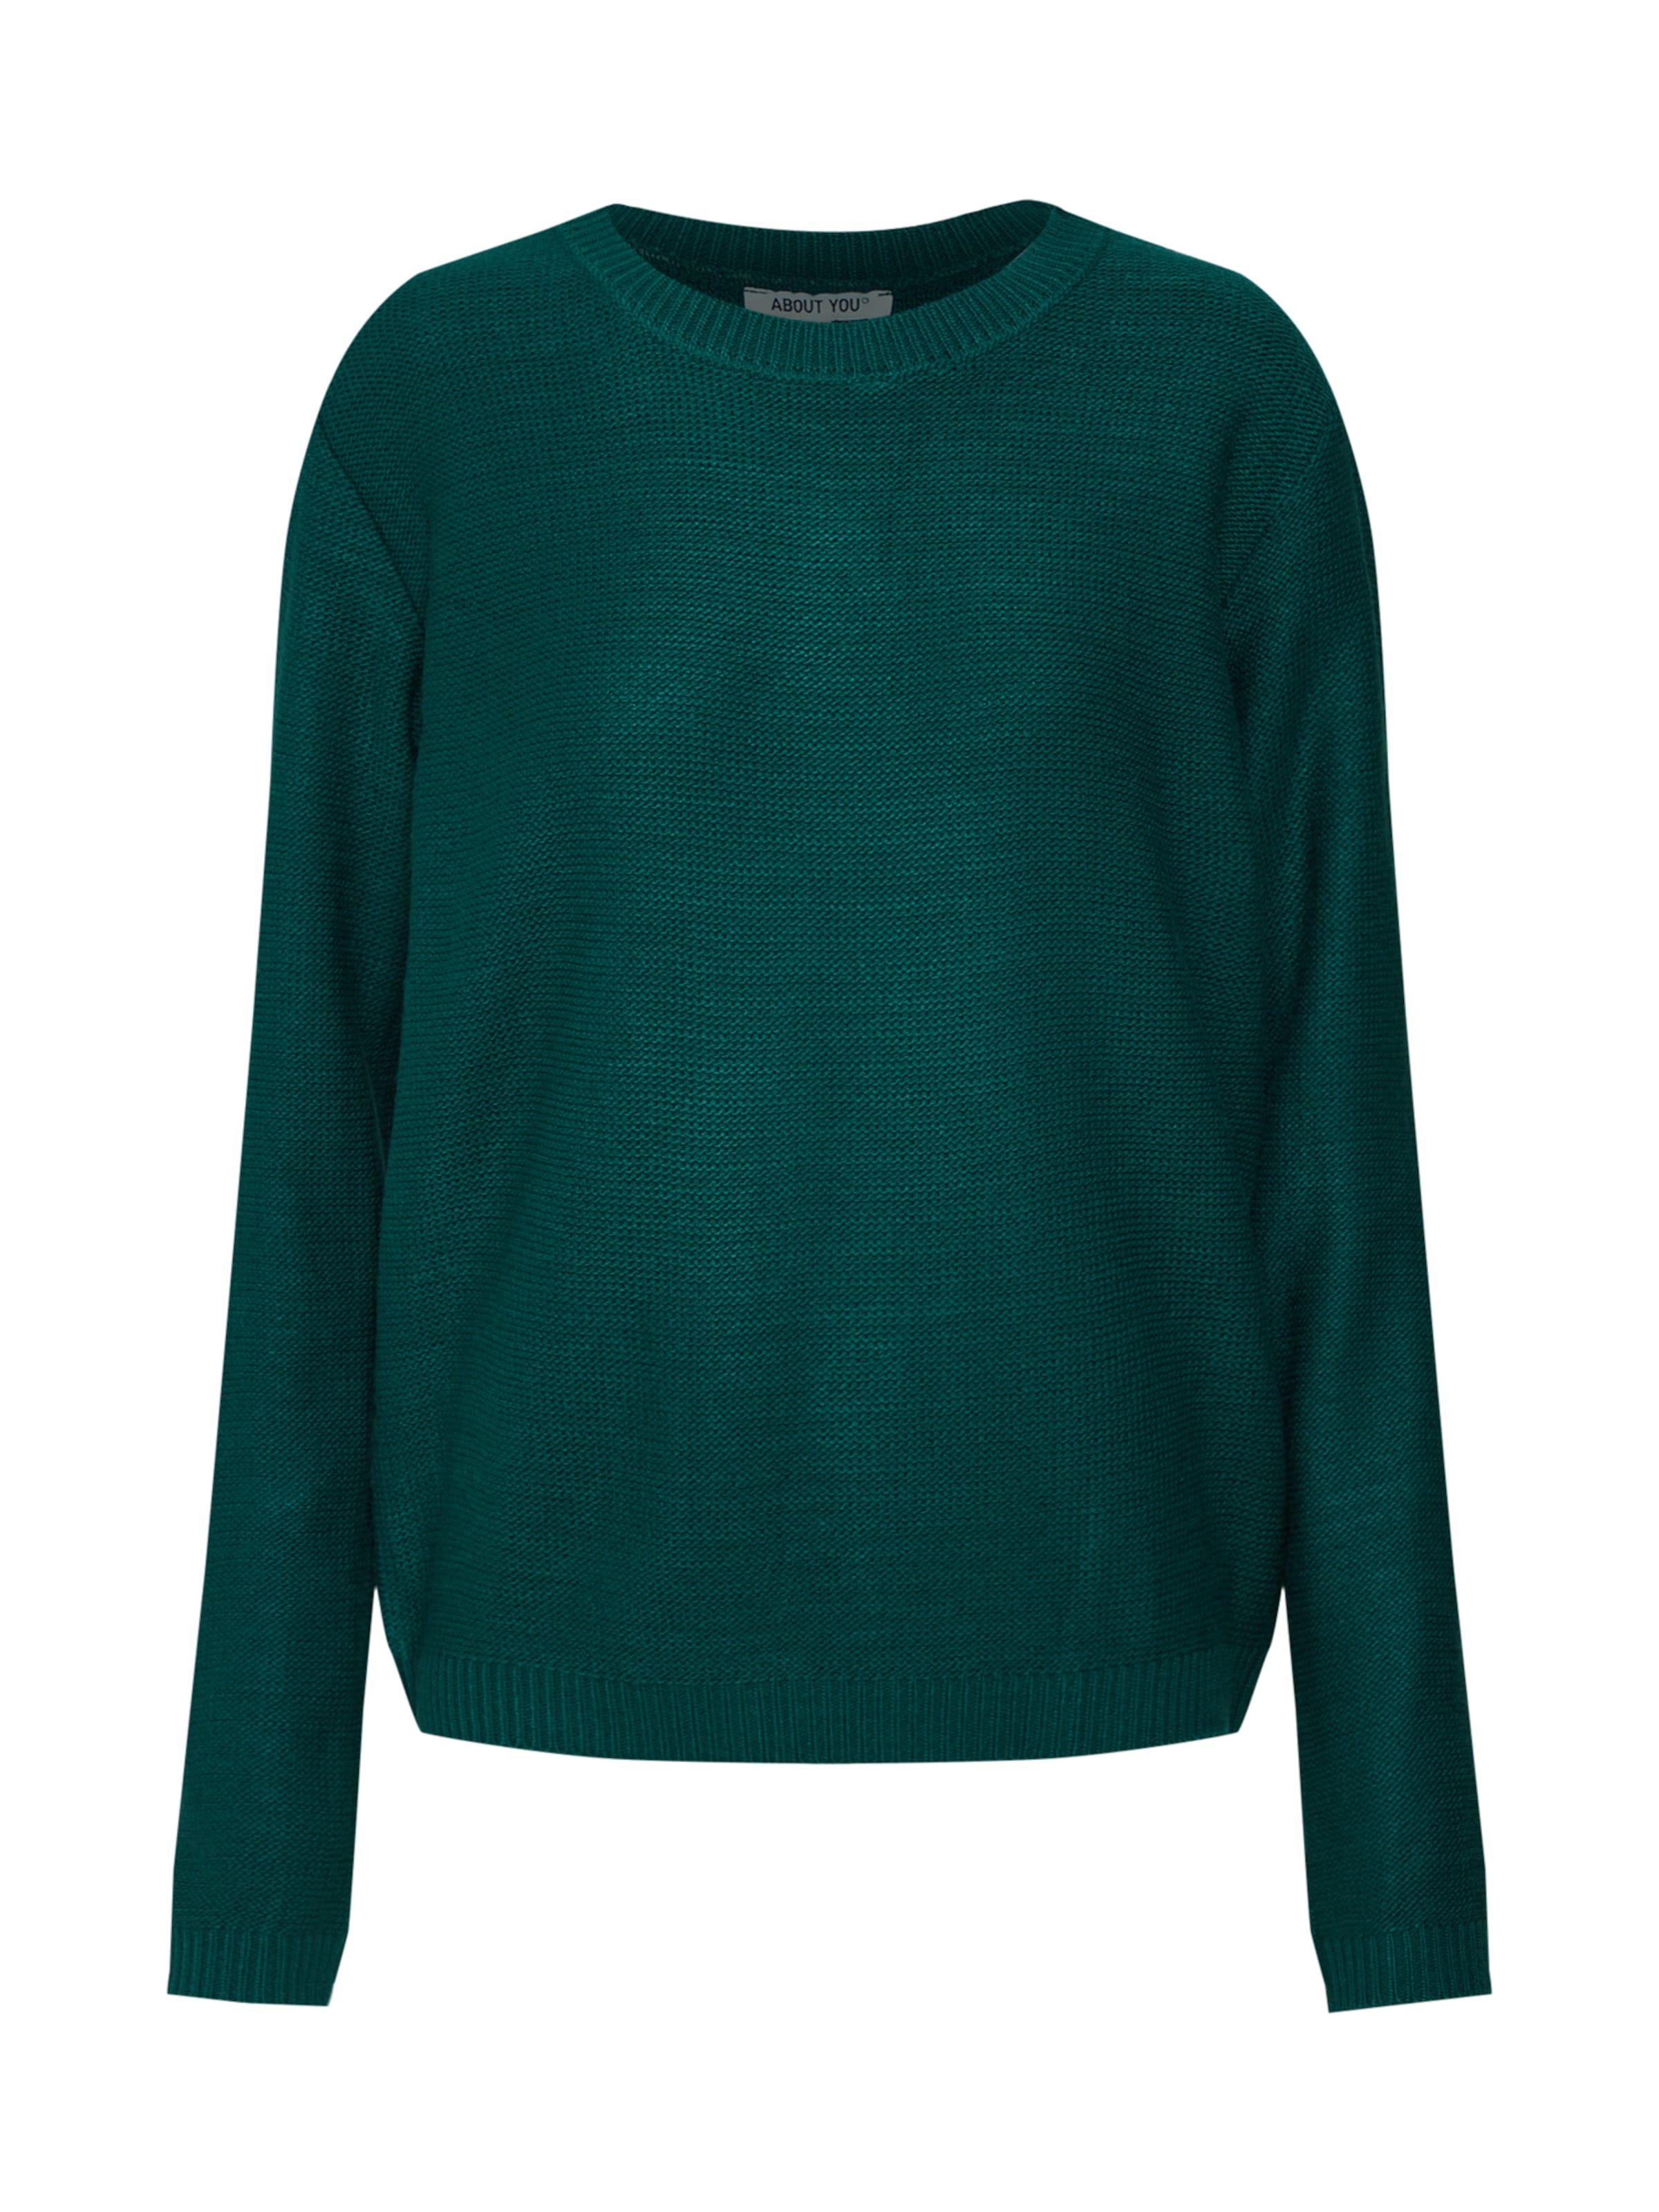 You 'victoria' About Pullover In Smaragd tQdrCshxB